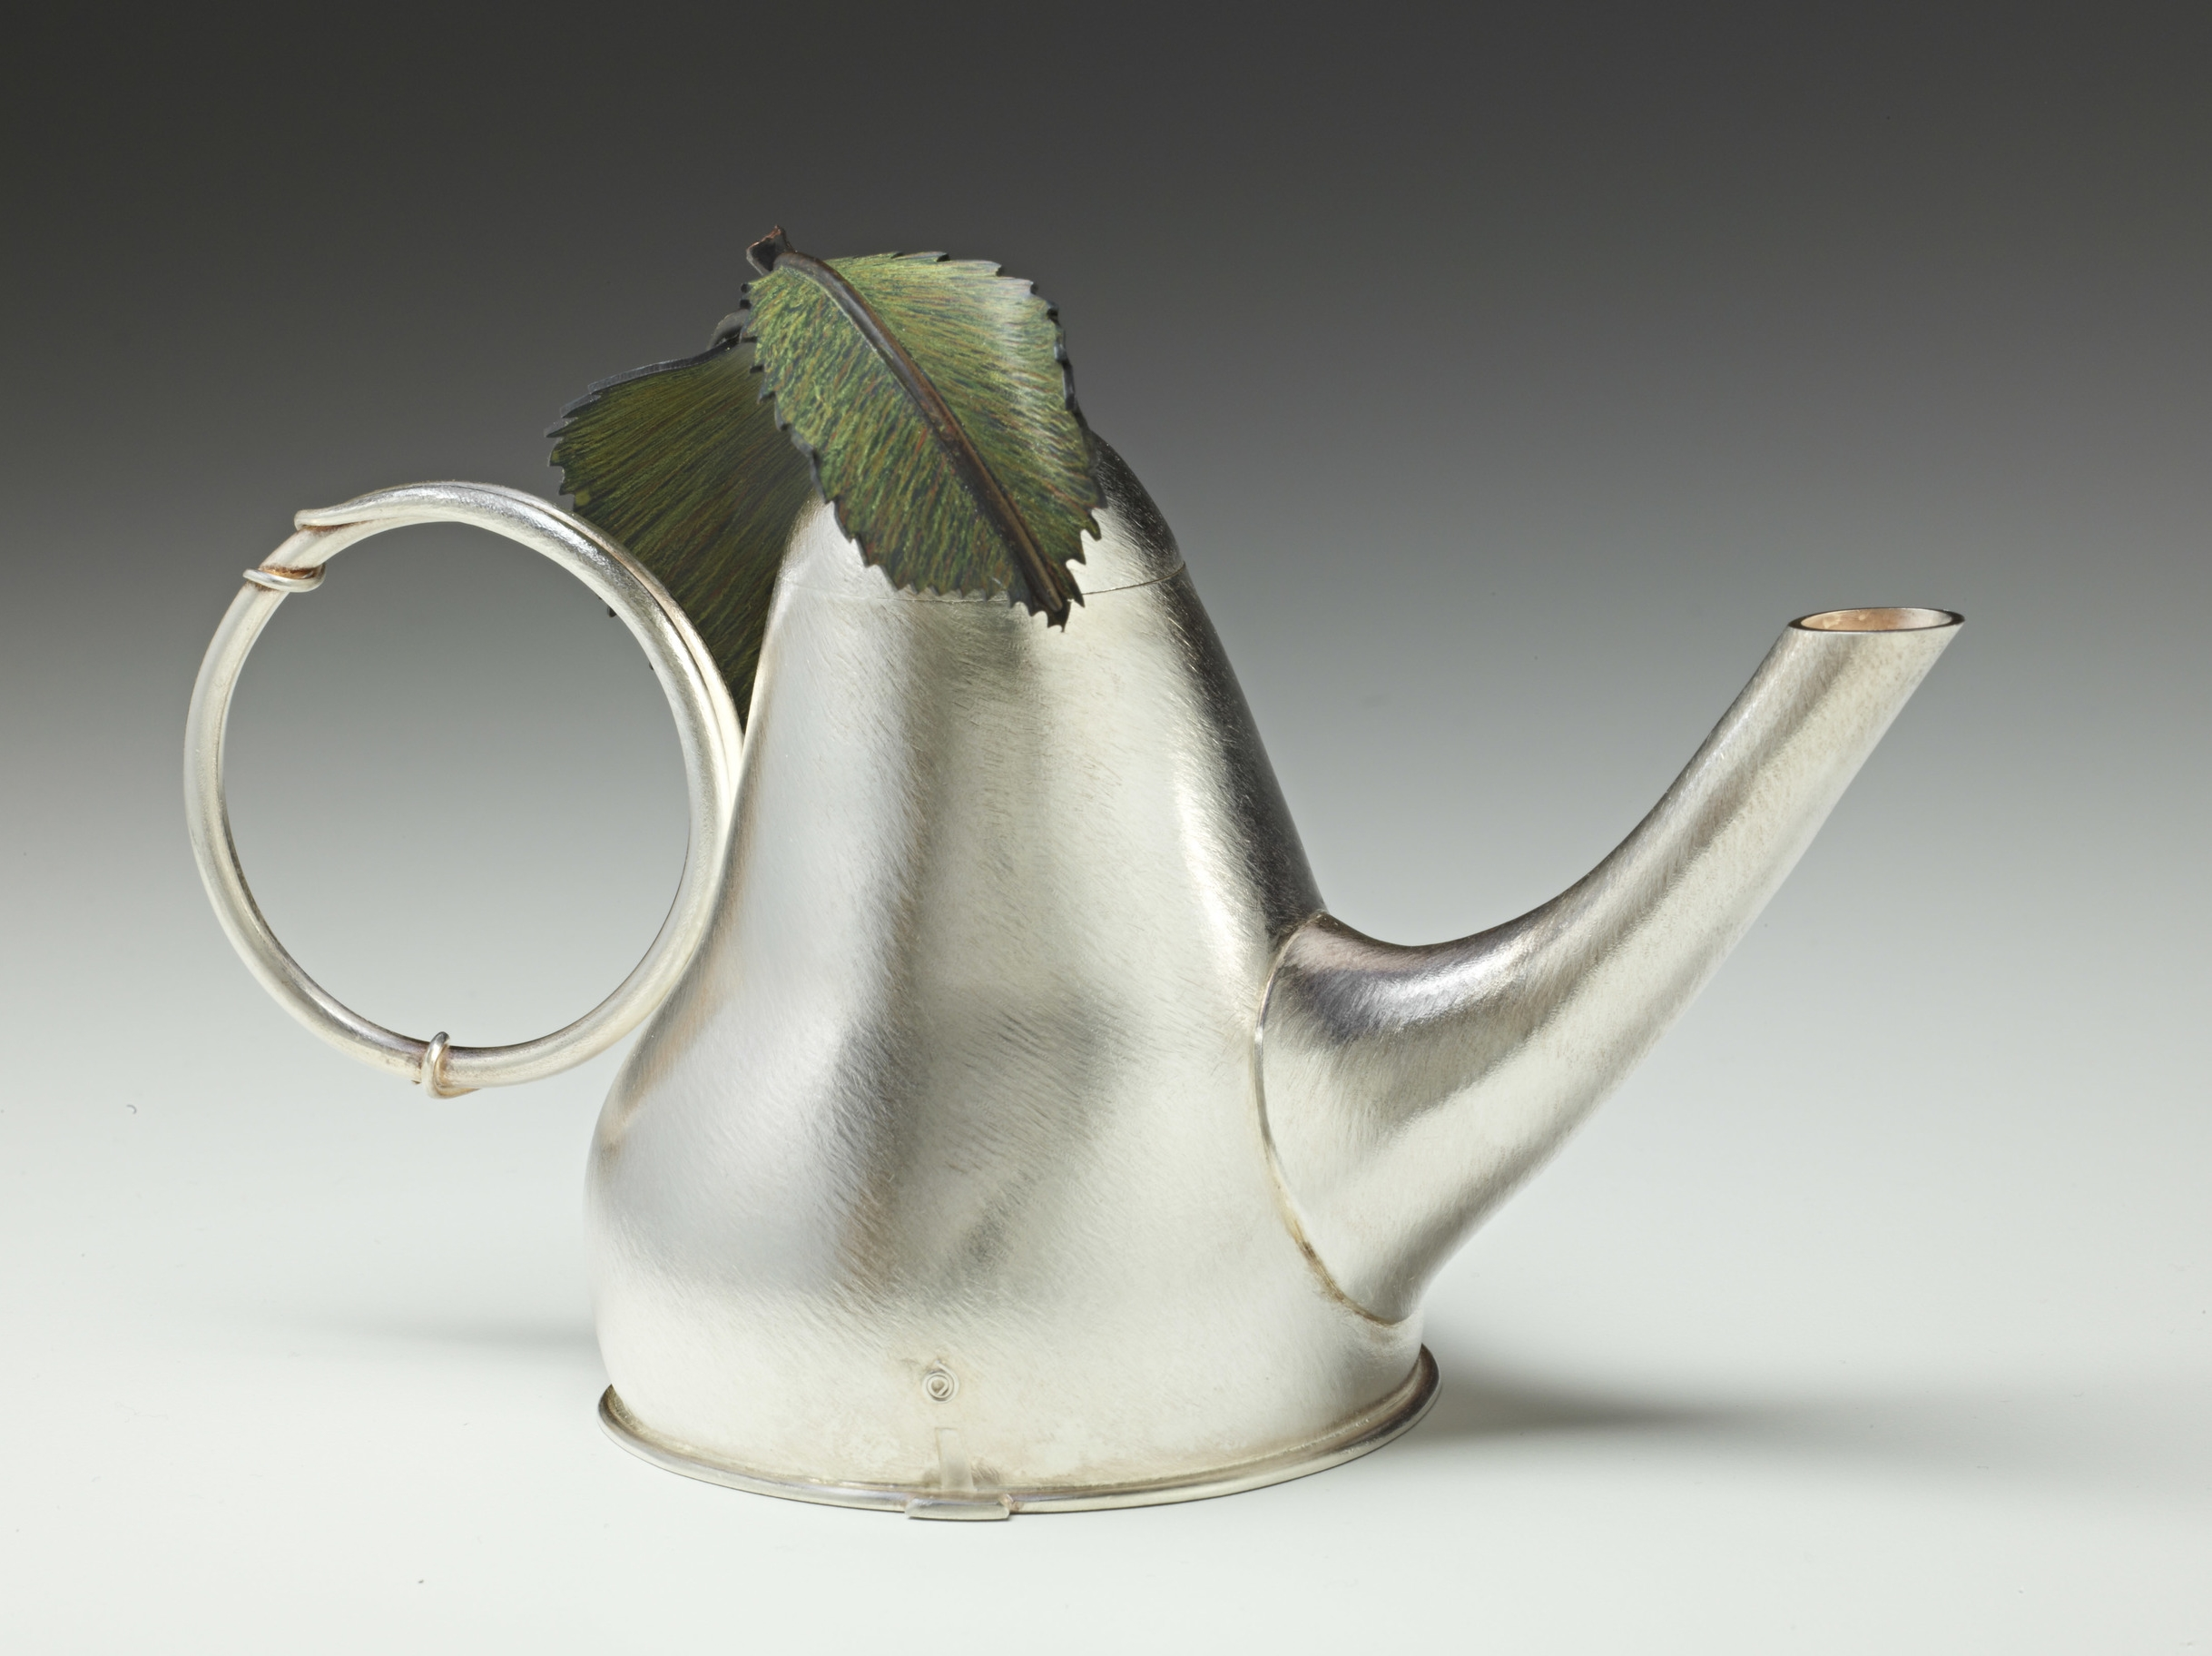 Silver Pear Teapot